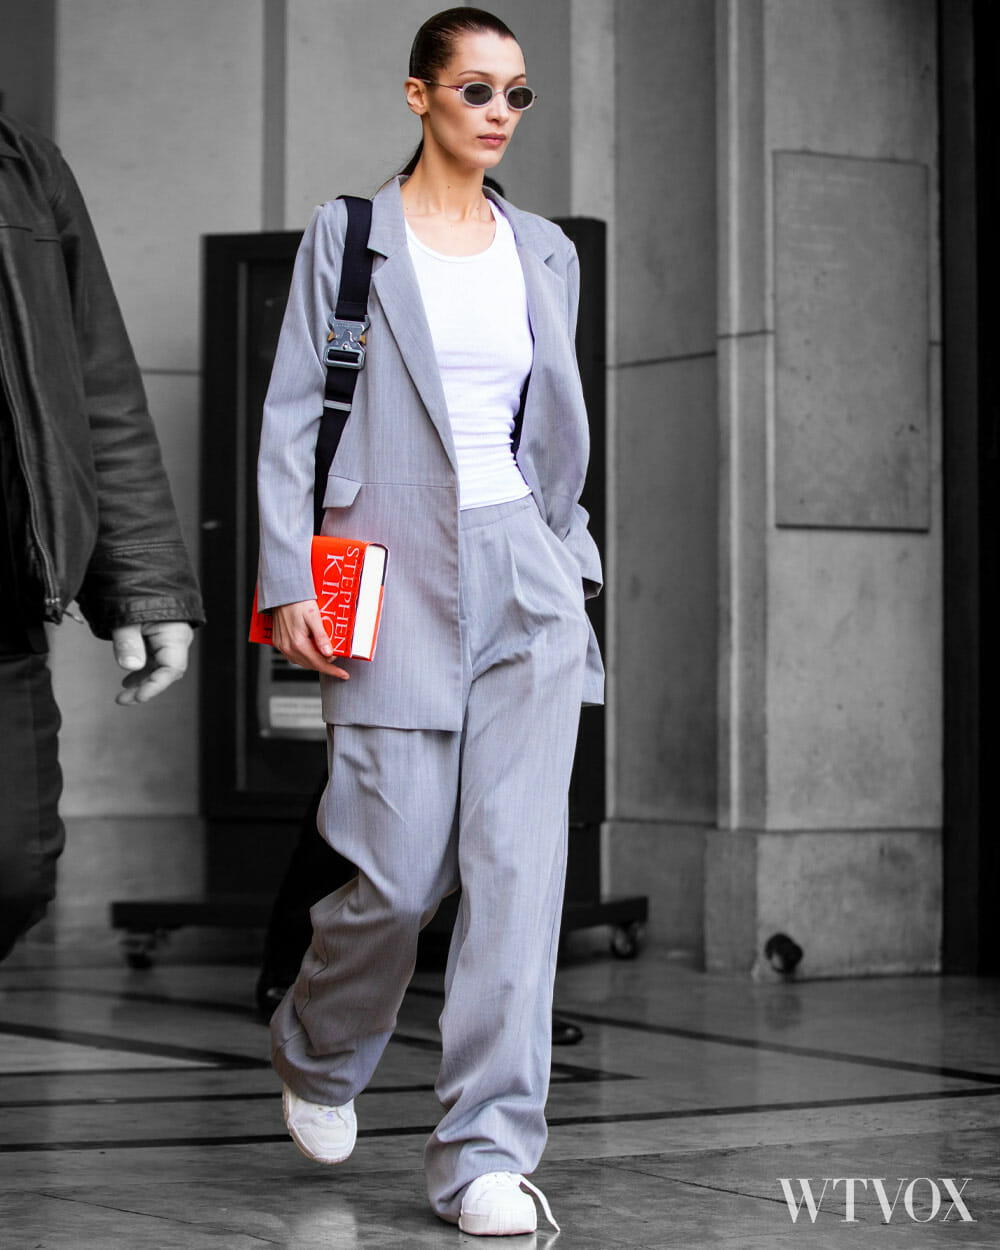 Bella Hadid Wearing Streetwear